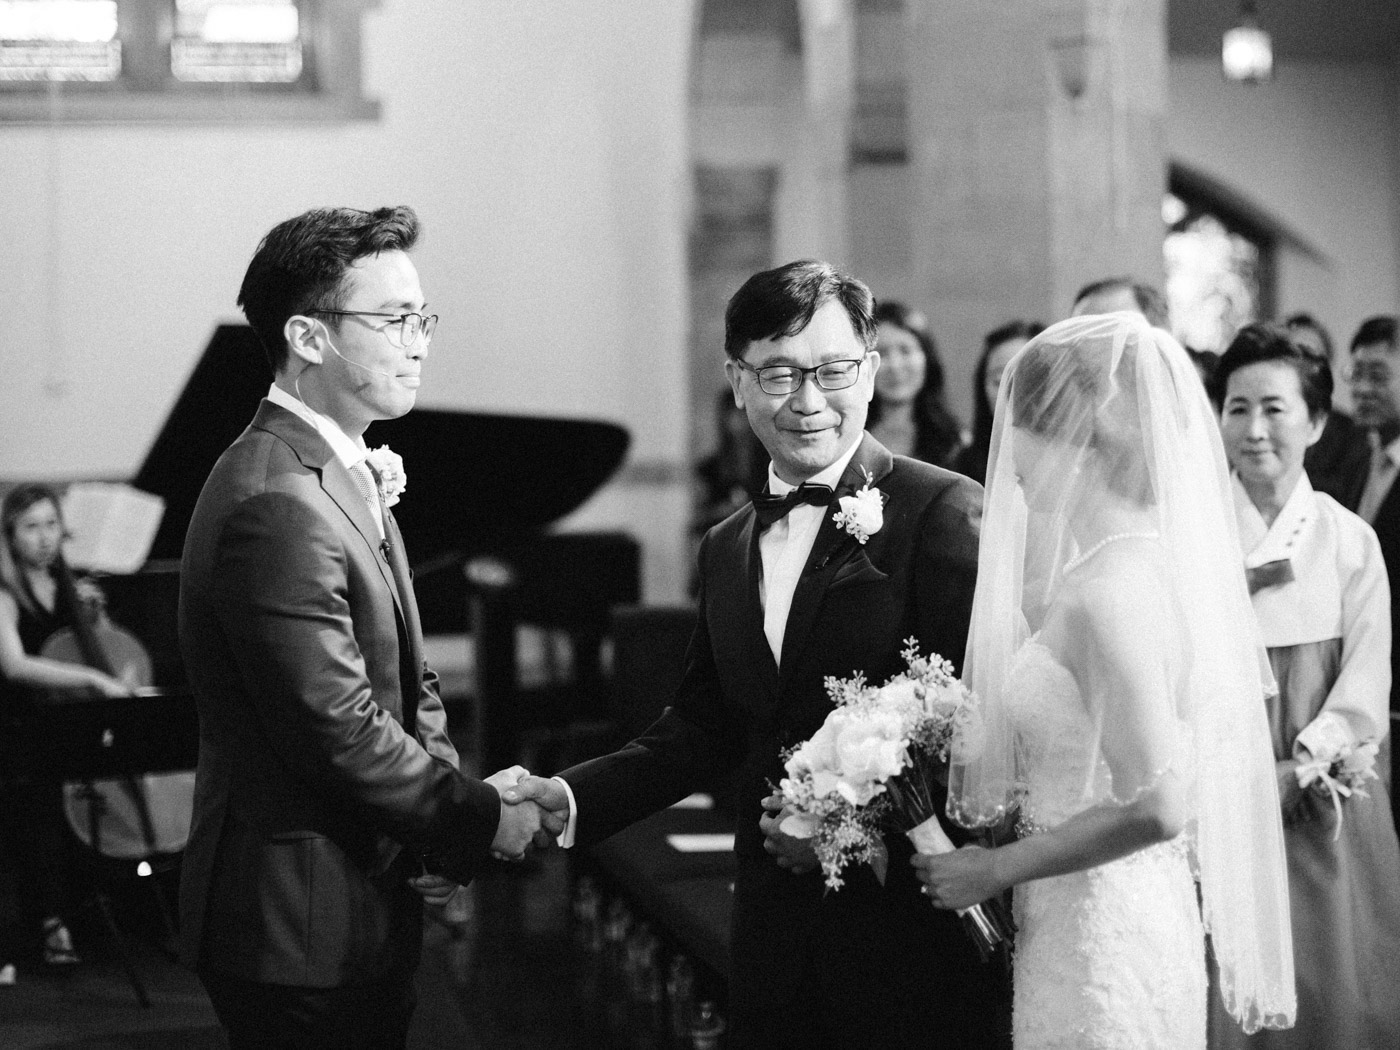 toronto_wedding_photographer_fine_art_documentary_photography-65.jpg